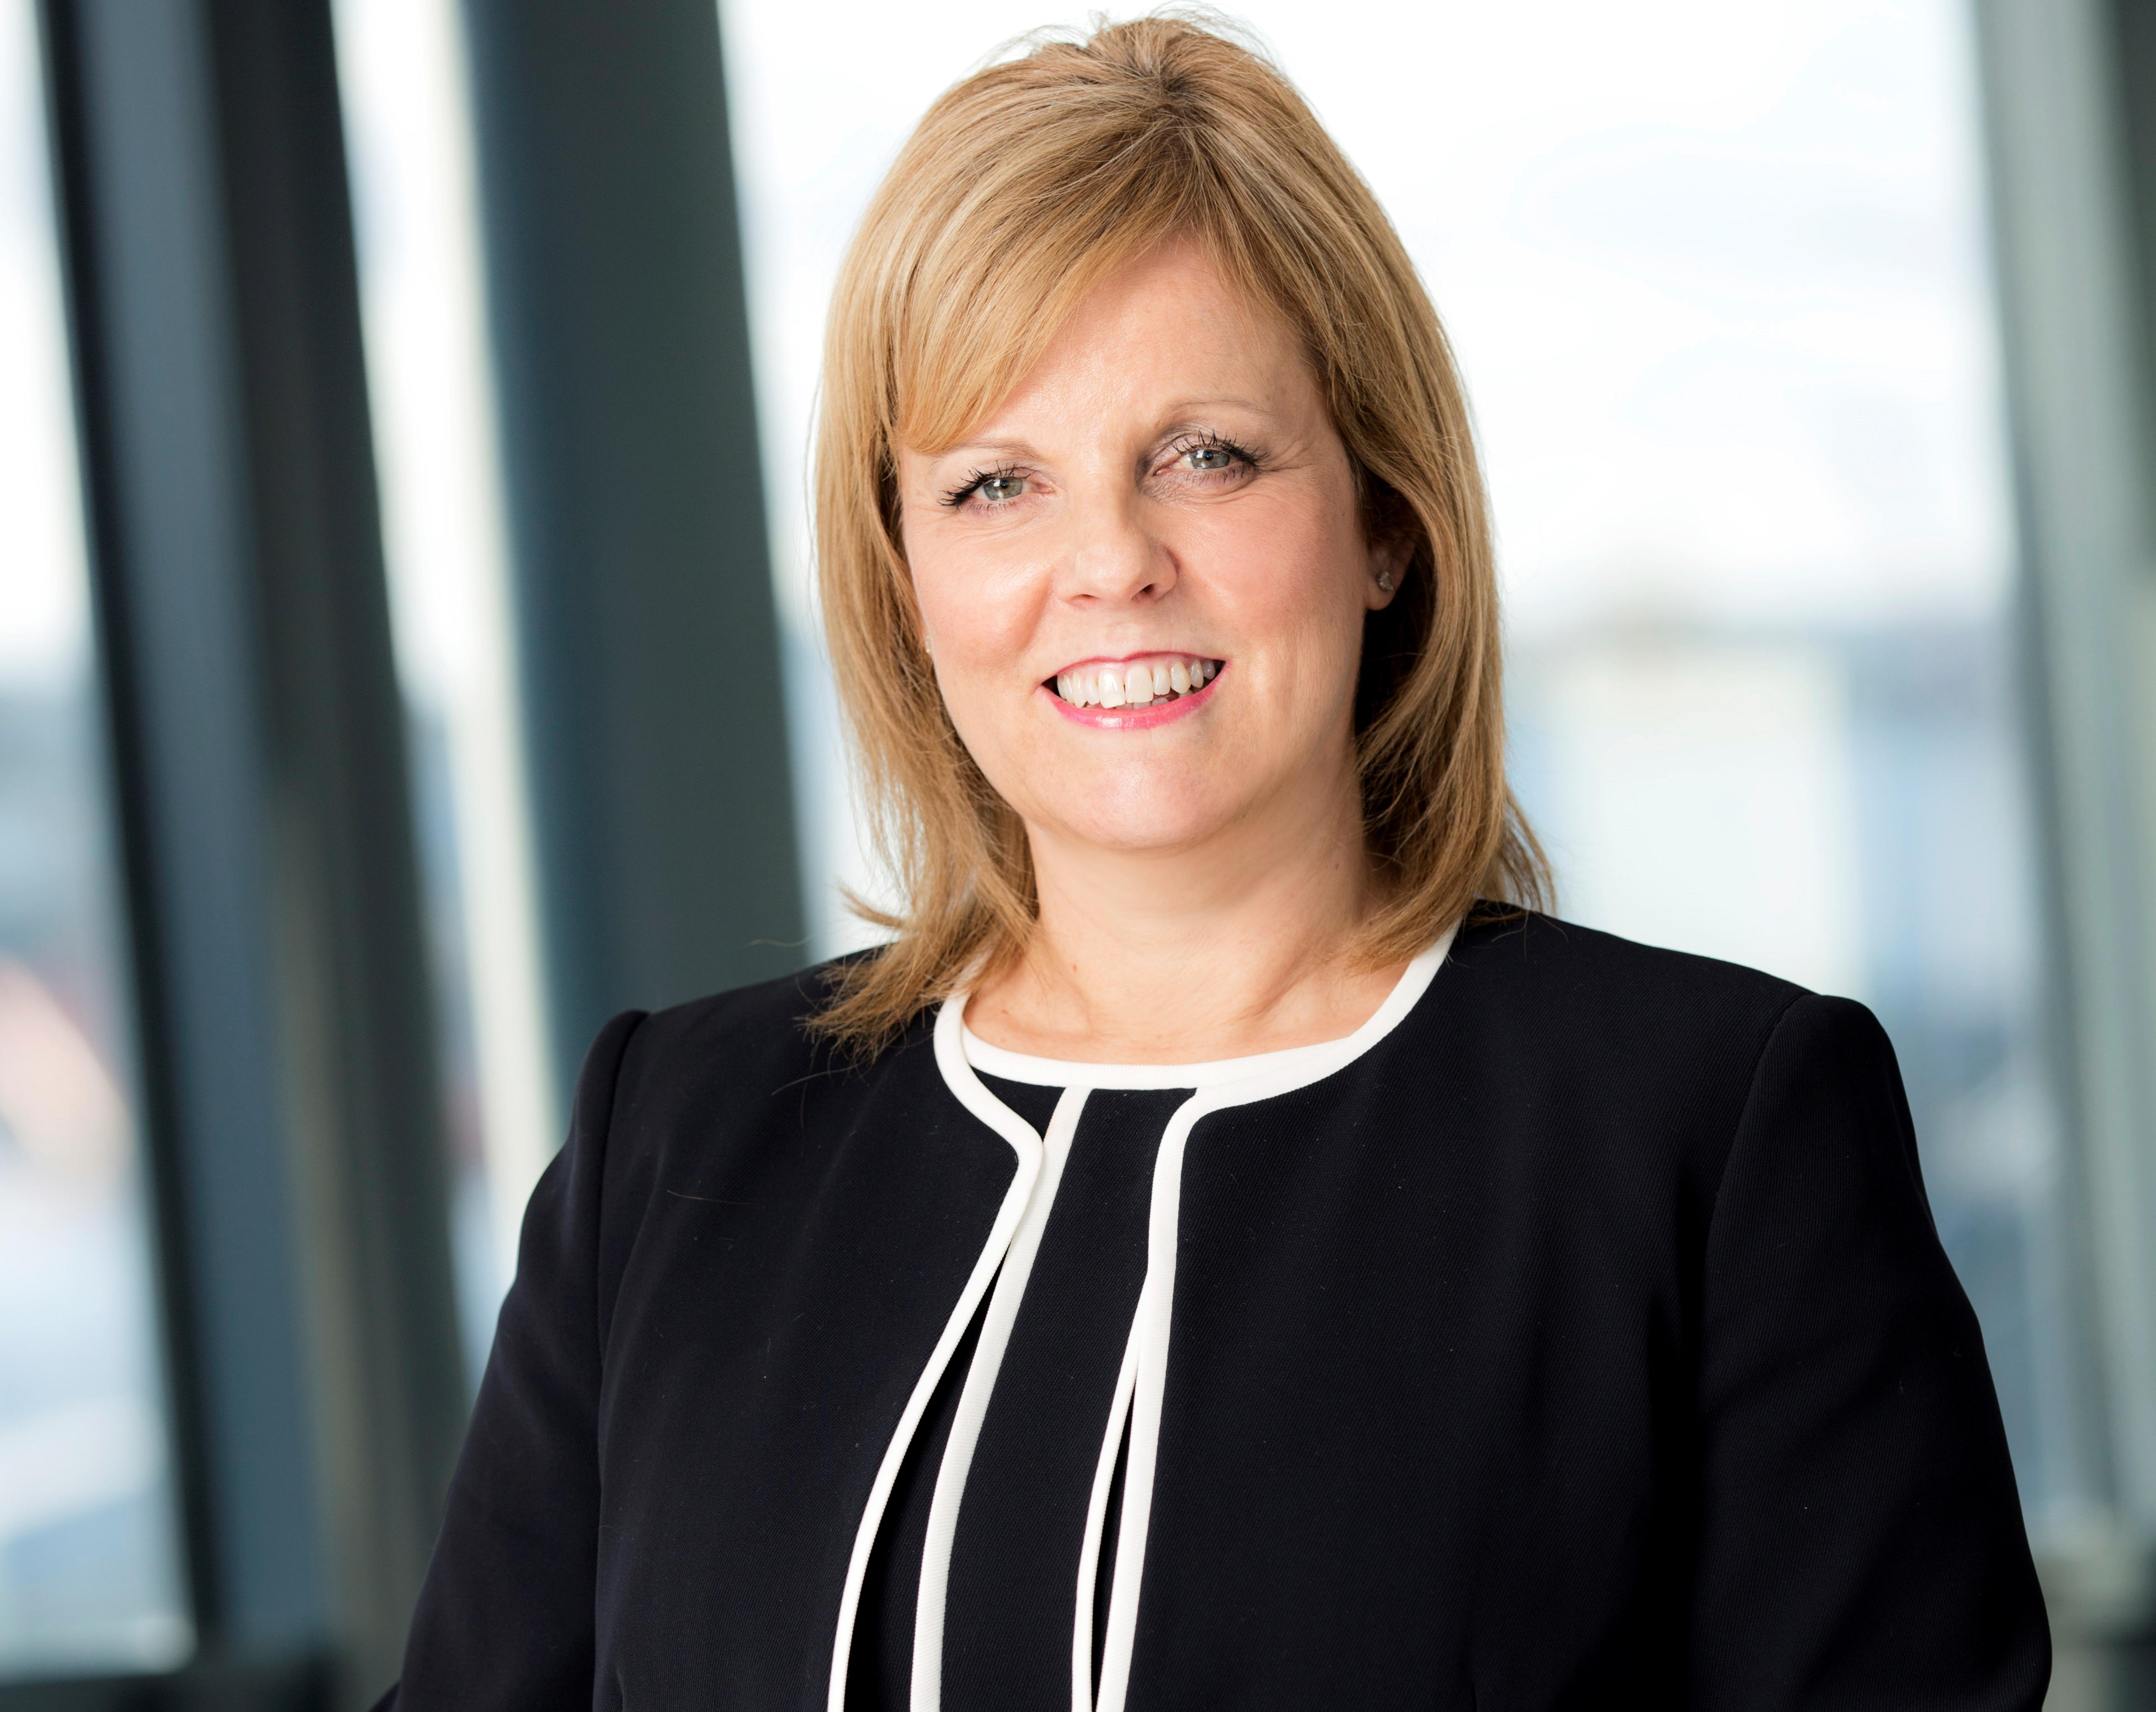 Michelle Handforth